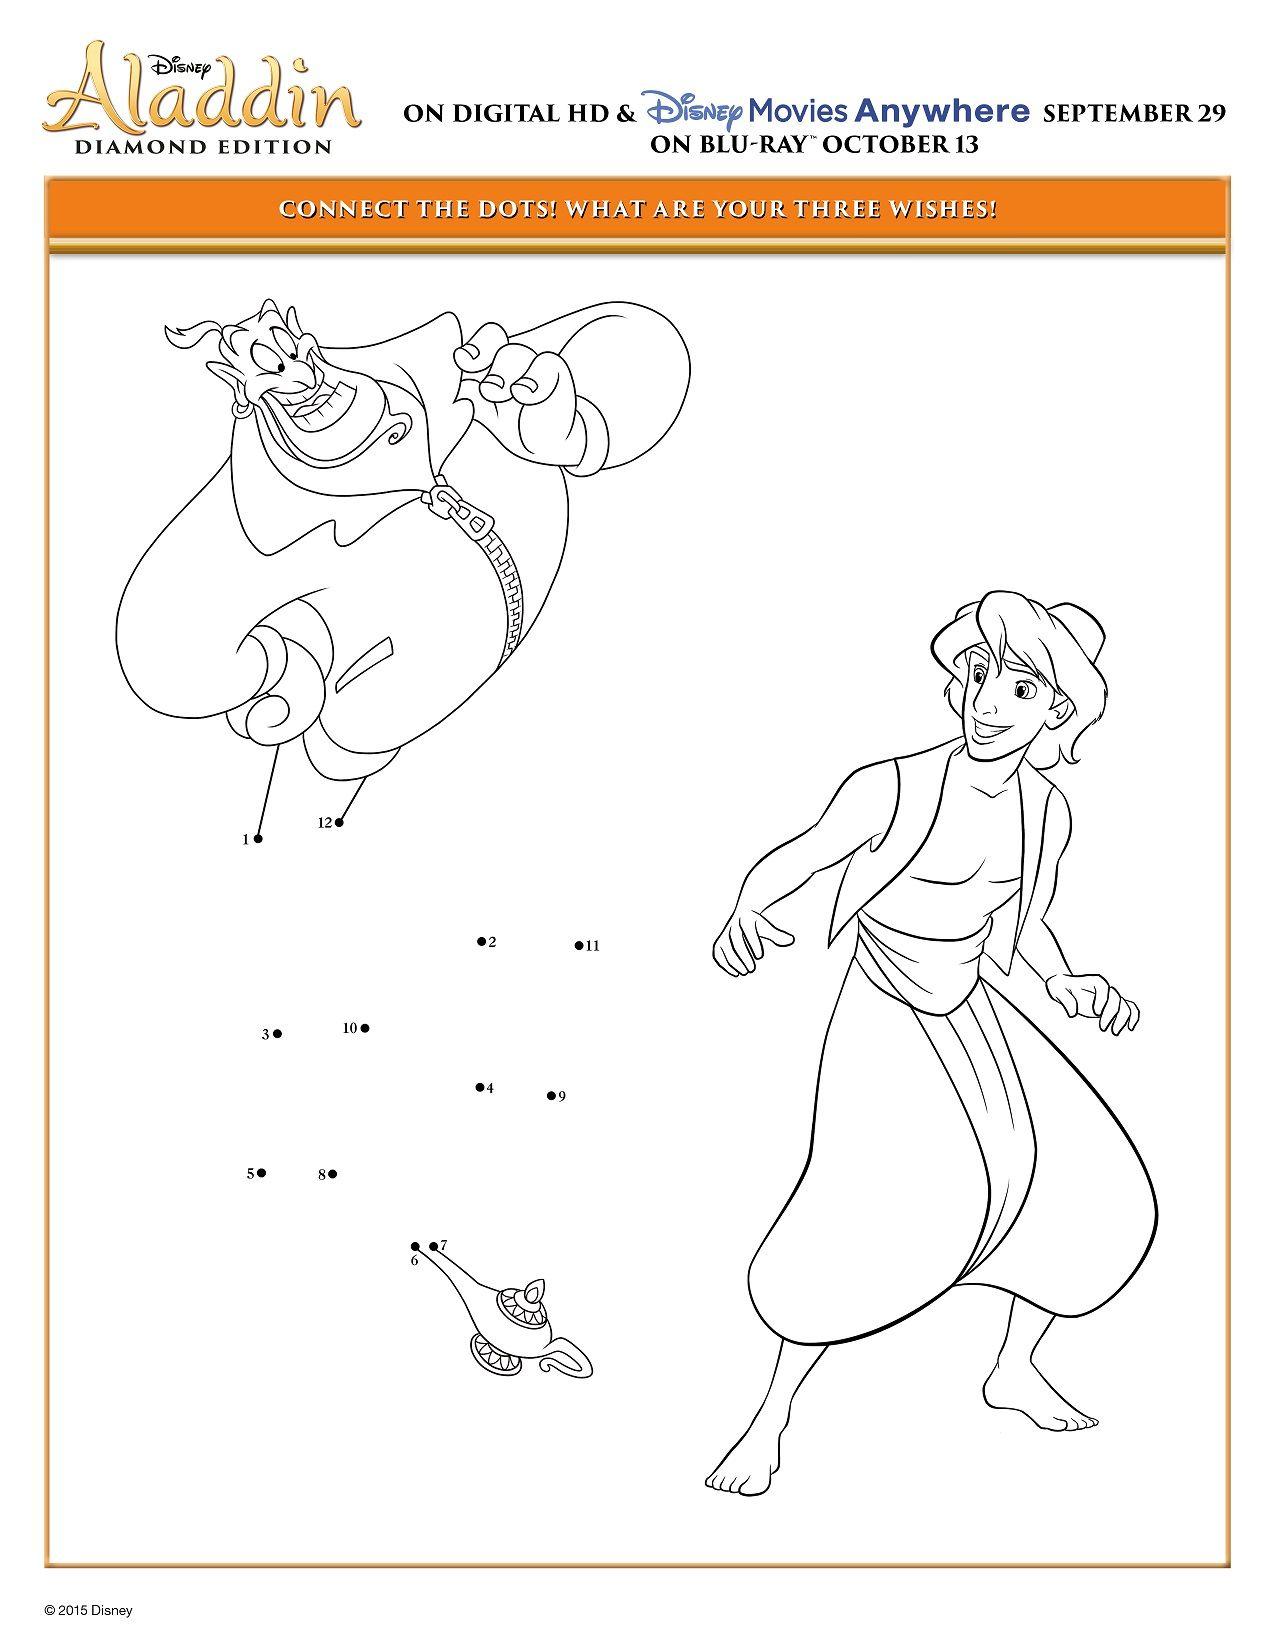 Disneyus aladdin u princess jasmine printable coloring pages